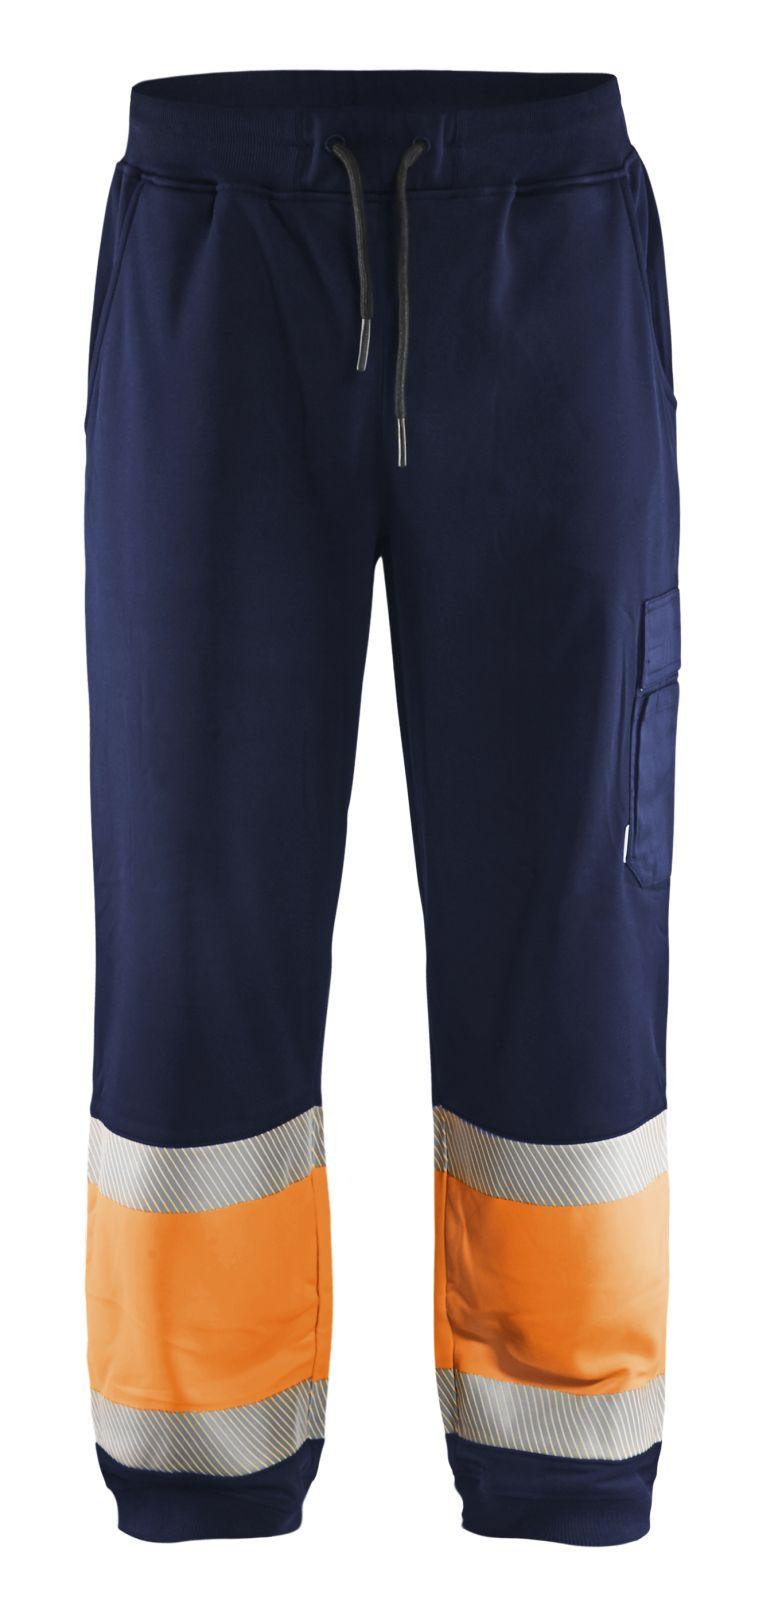 Blaklader Sweatbroeken 15492526 High Vis marineblauw-oranje(8953)